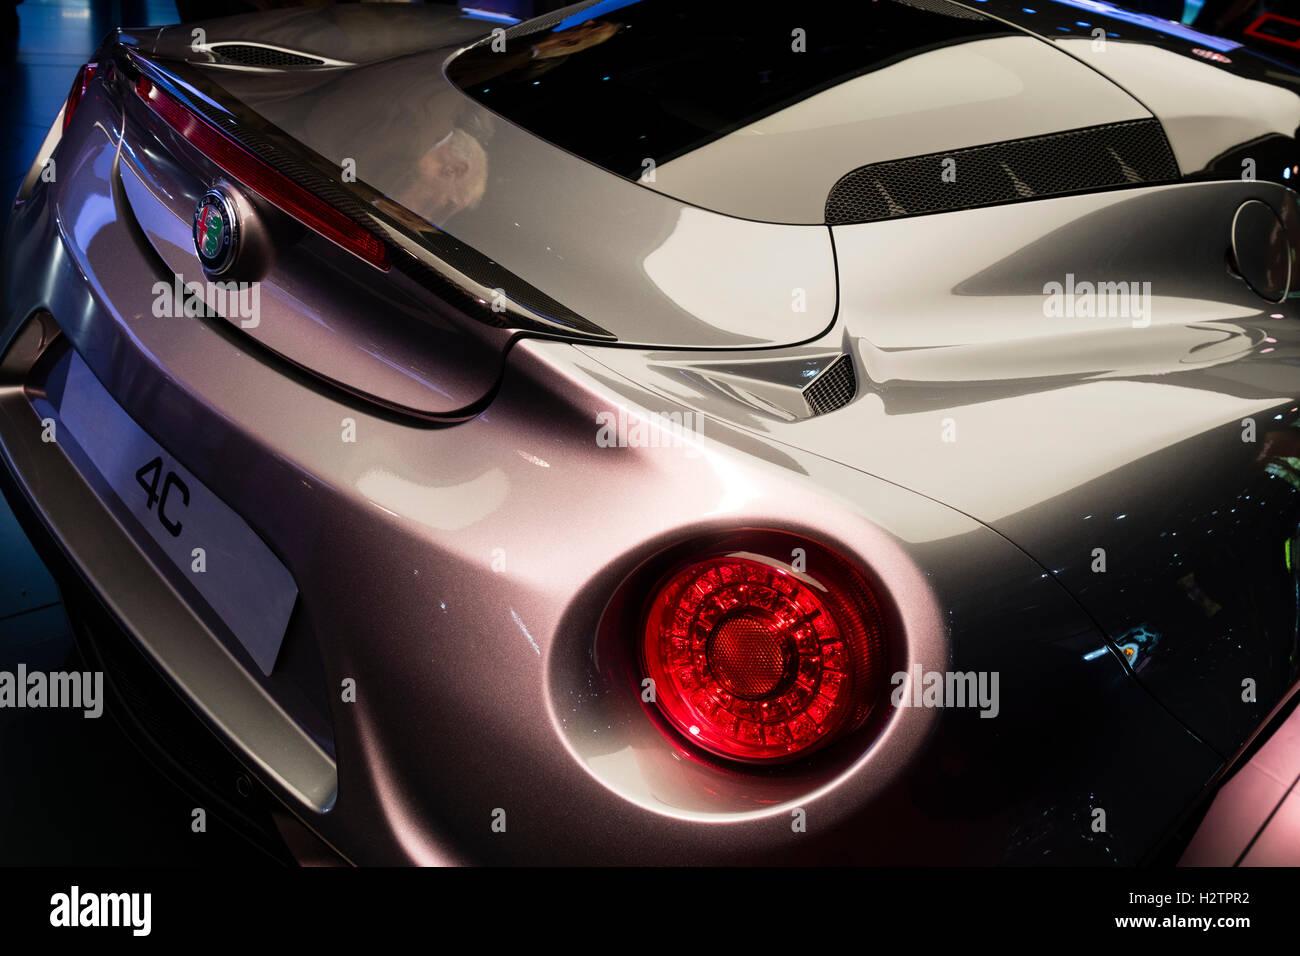 4c Stockfotos Bilder Alamy Alfa Romeo Engine Diagram Detail Des Auto Auf Der Paris Motor Show 2016 Stockbild